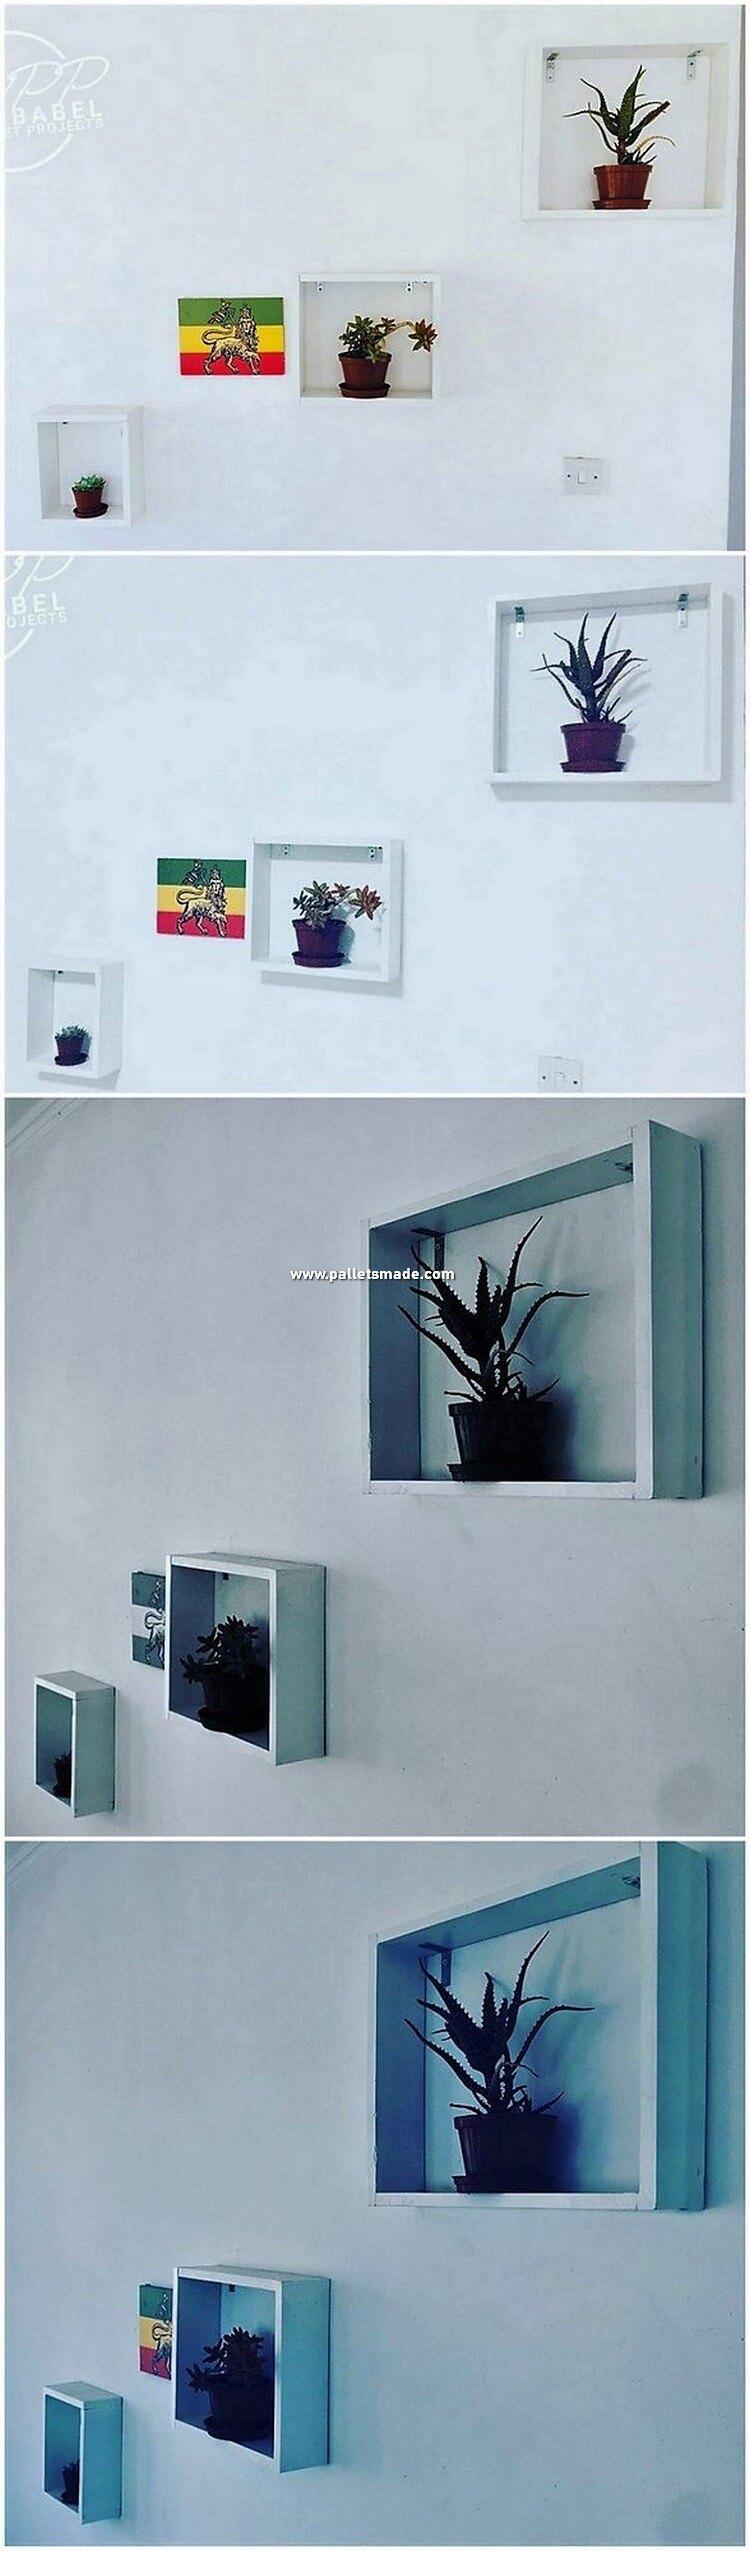 Pallet Wall Decorative Shelves